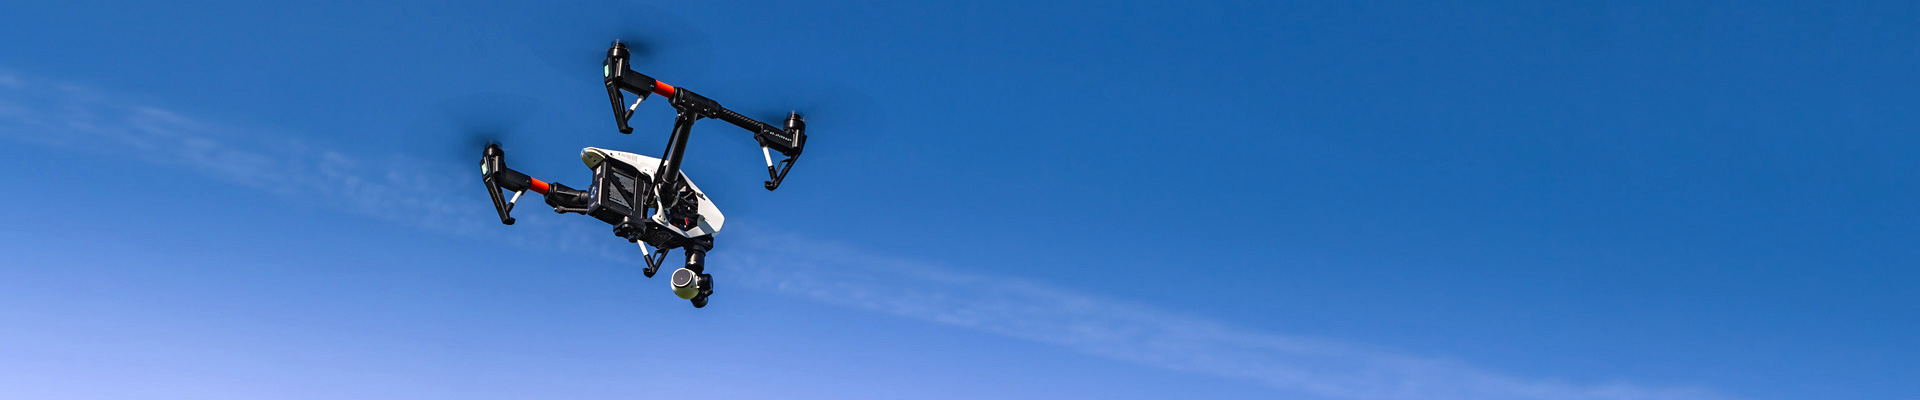 slide-inspire-vuduciel-airborne-flip